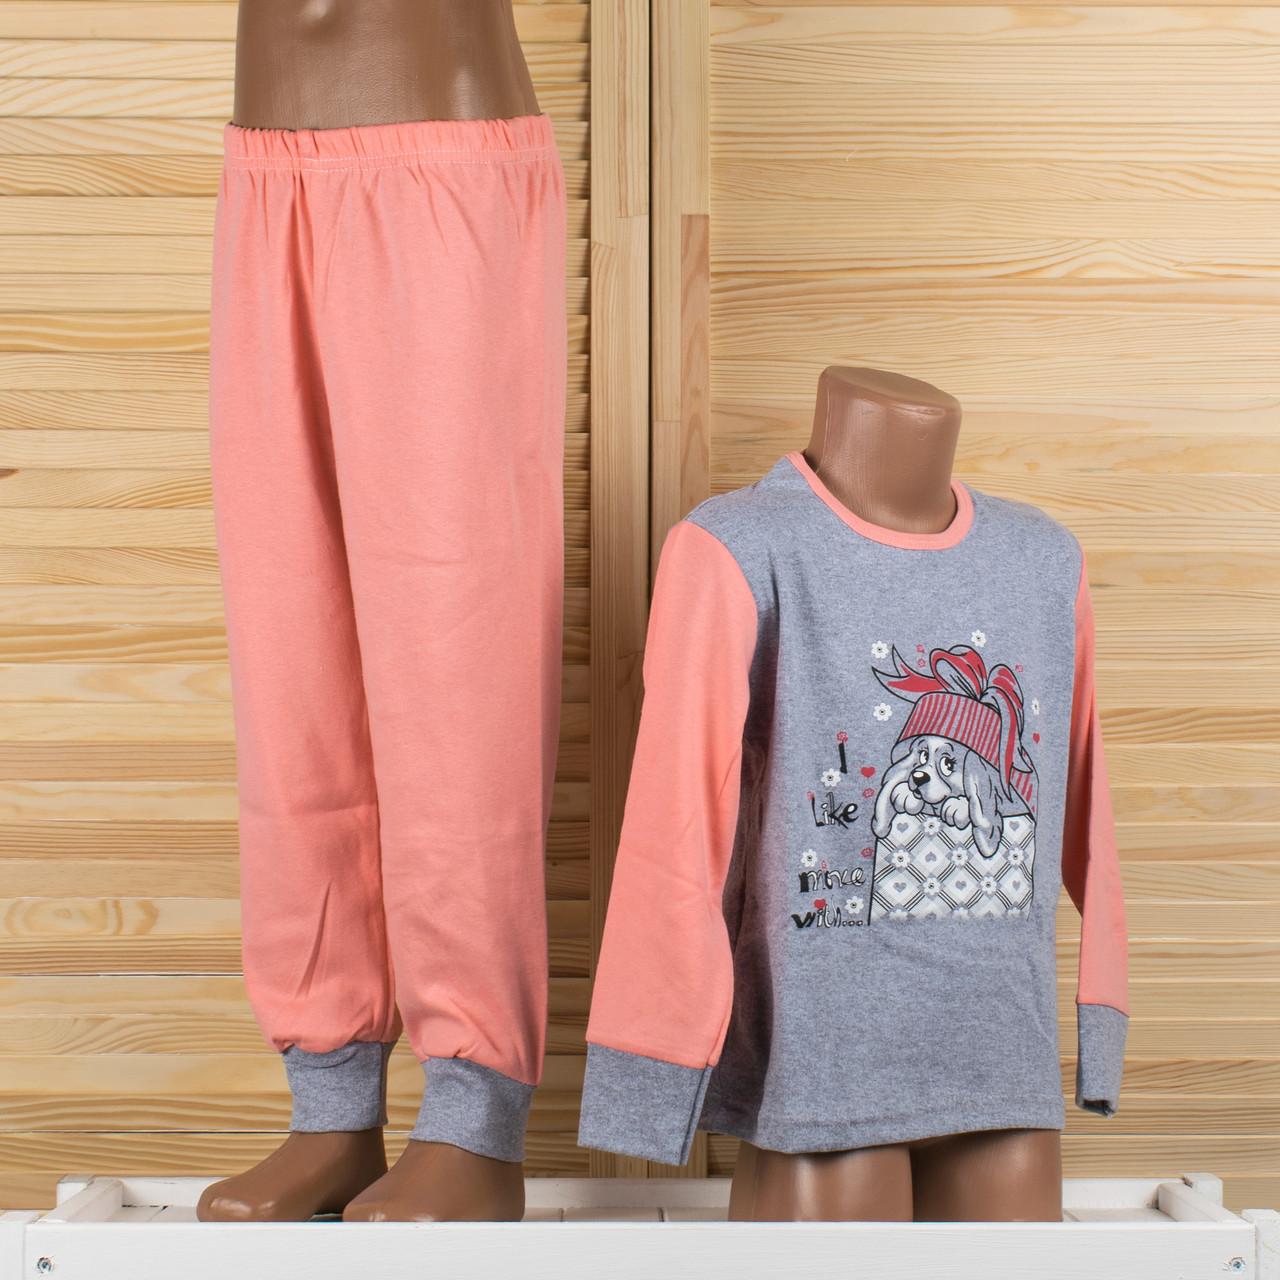 Детская пижама на девочку Турция. Moral 05-4 2/3. Размер на 2/3 года.